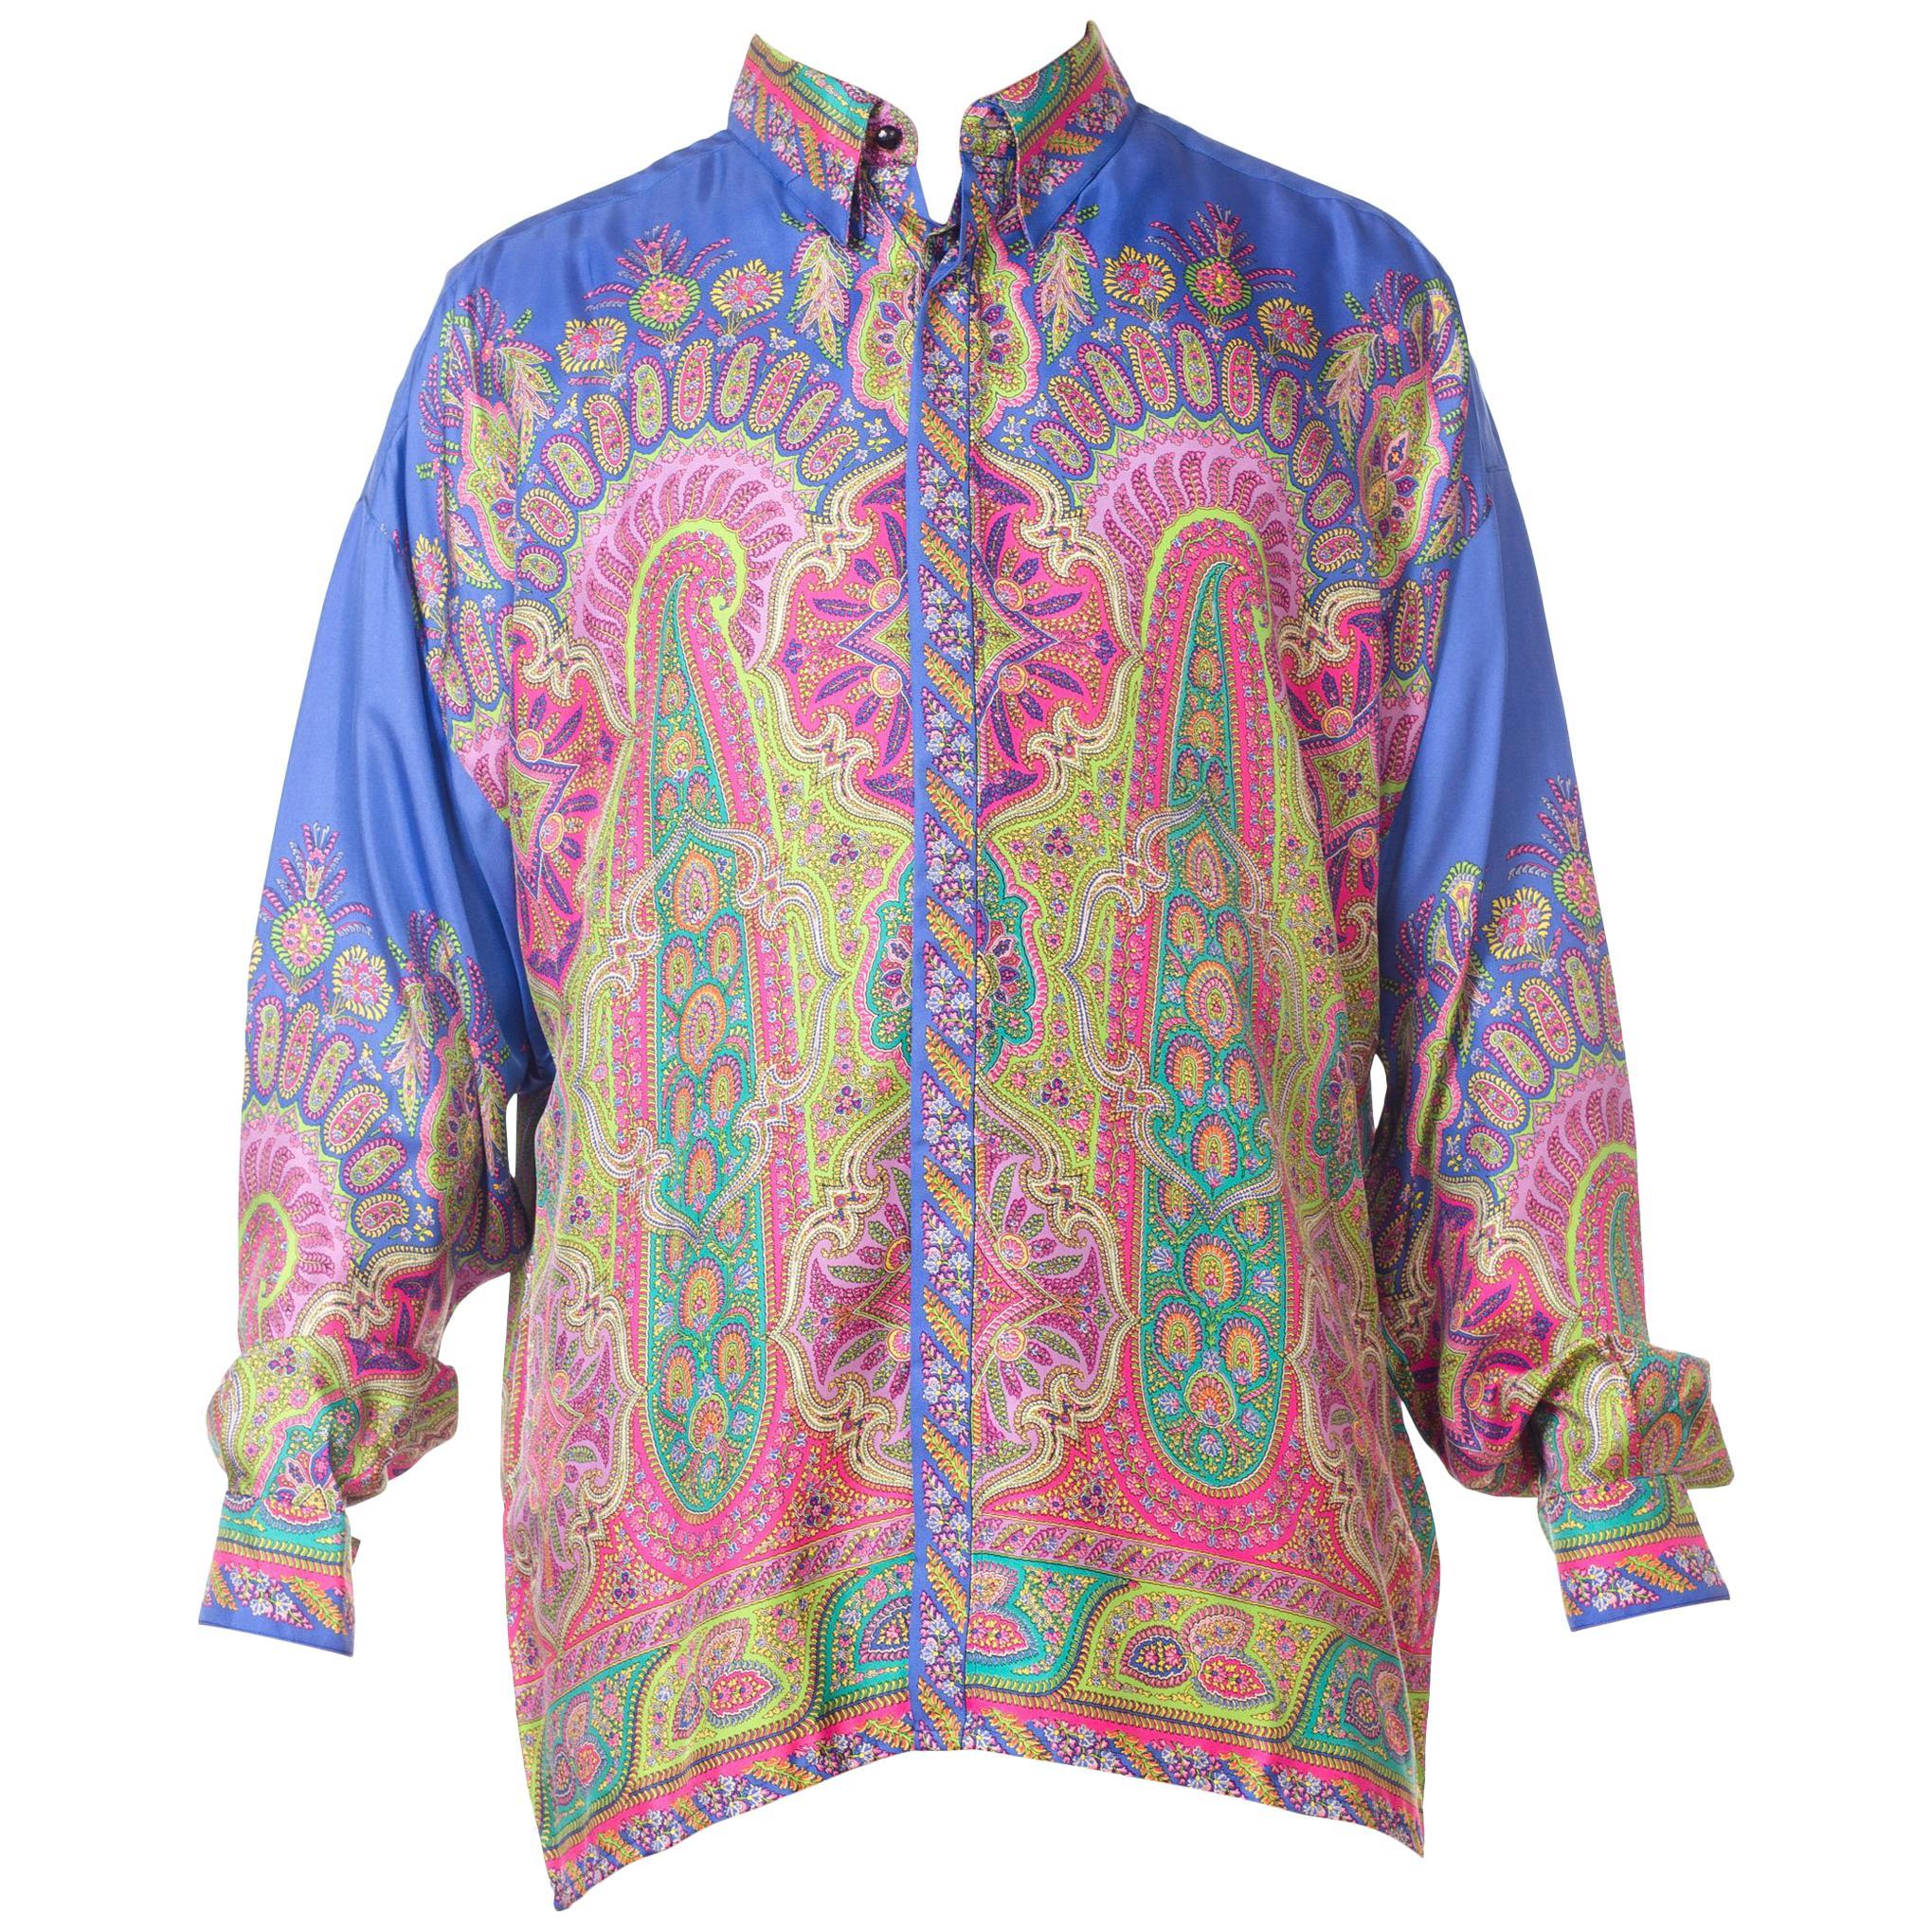 1990S GIANNI VERSACE Men's Silk Paisley Shirt Sz 52